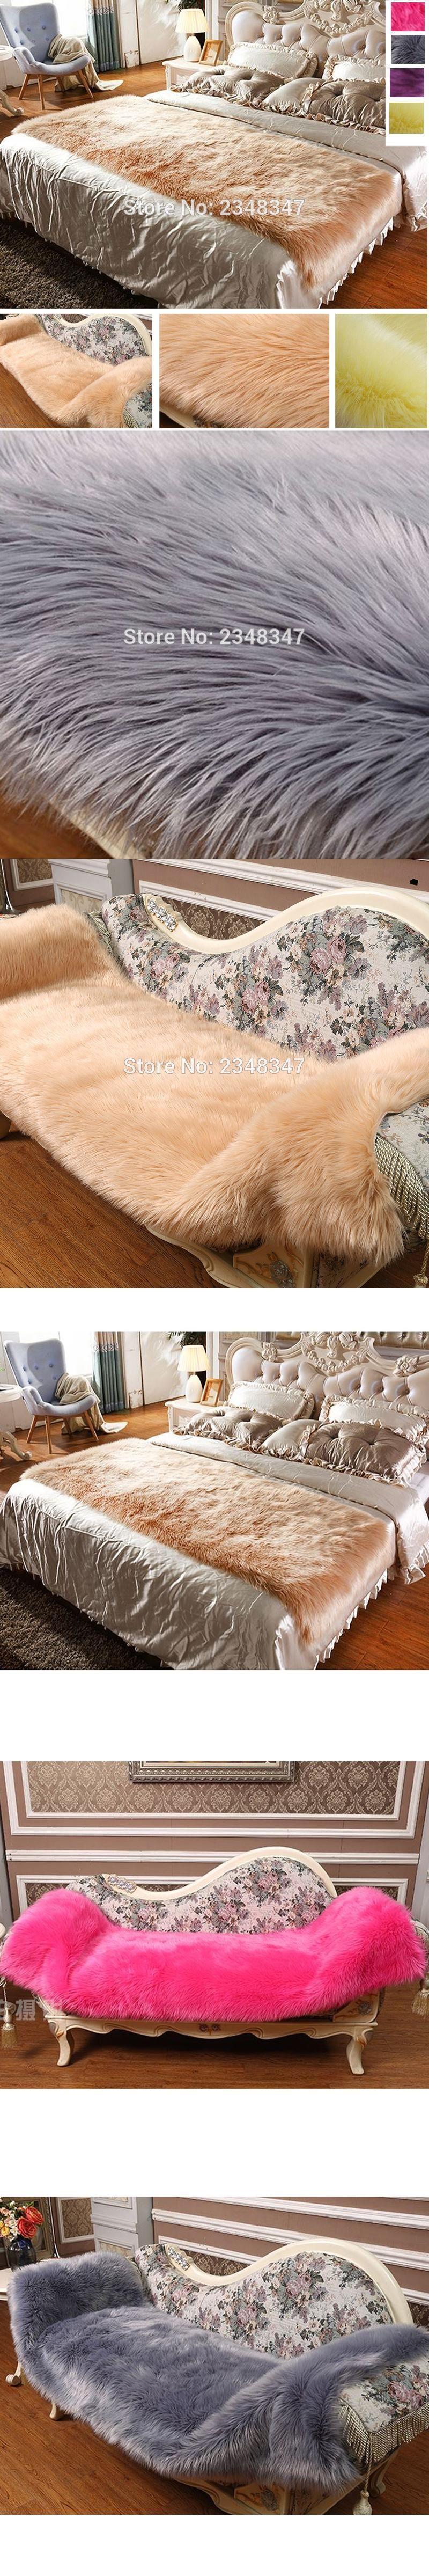 long fur artificial sheepskin rectangle fluffy sofa bed cover carpet